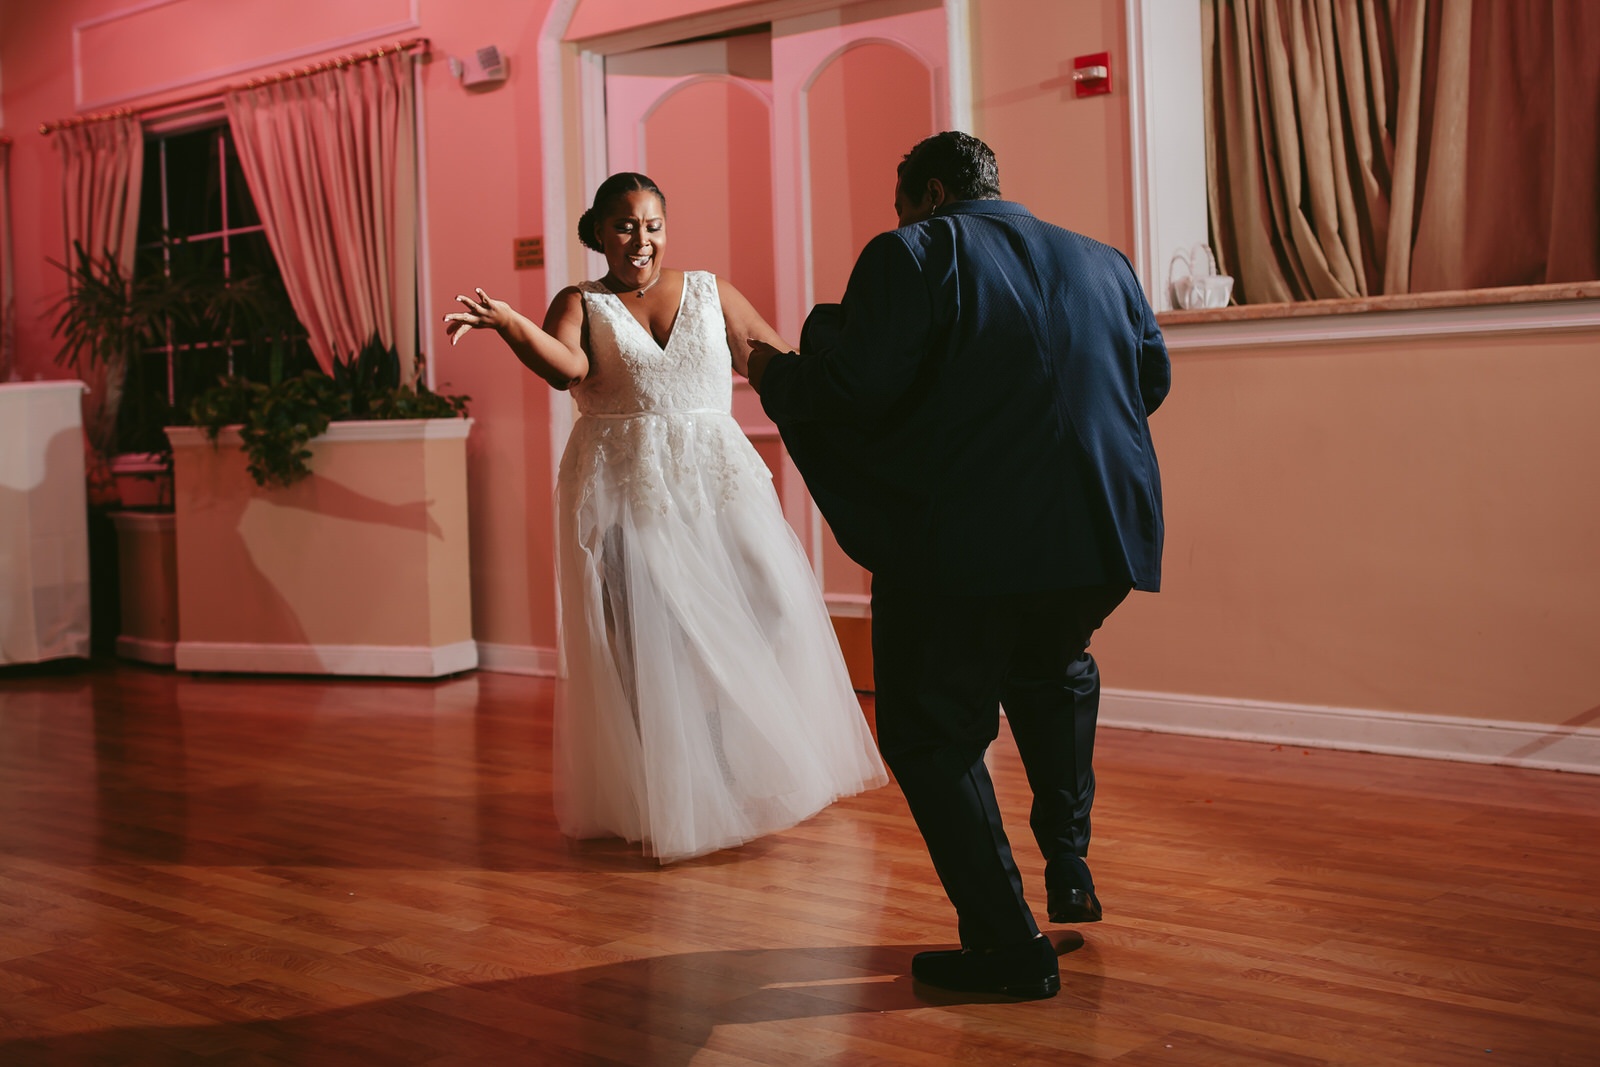 Bride_Entrance_Benvenuto_Wedding_Party_Fun_Dancing_Tiny_House_Photo.jpg